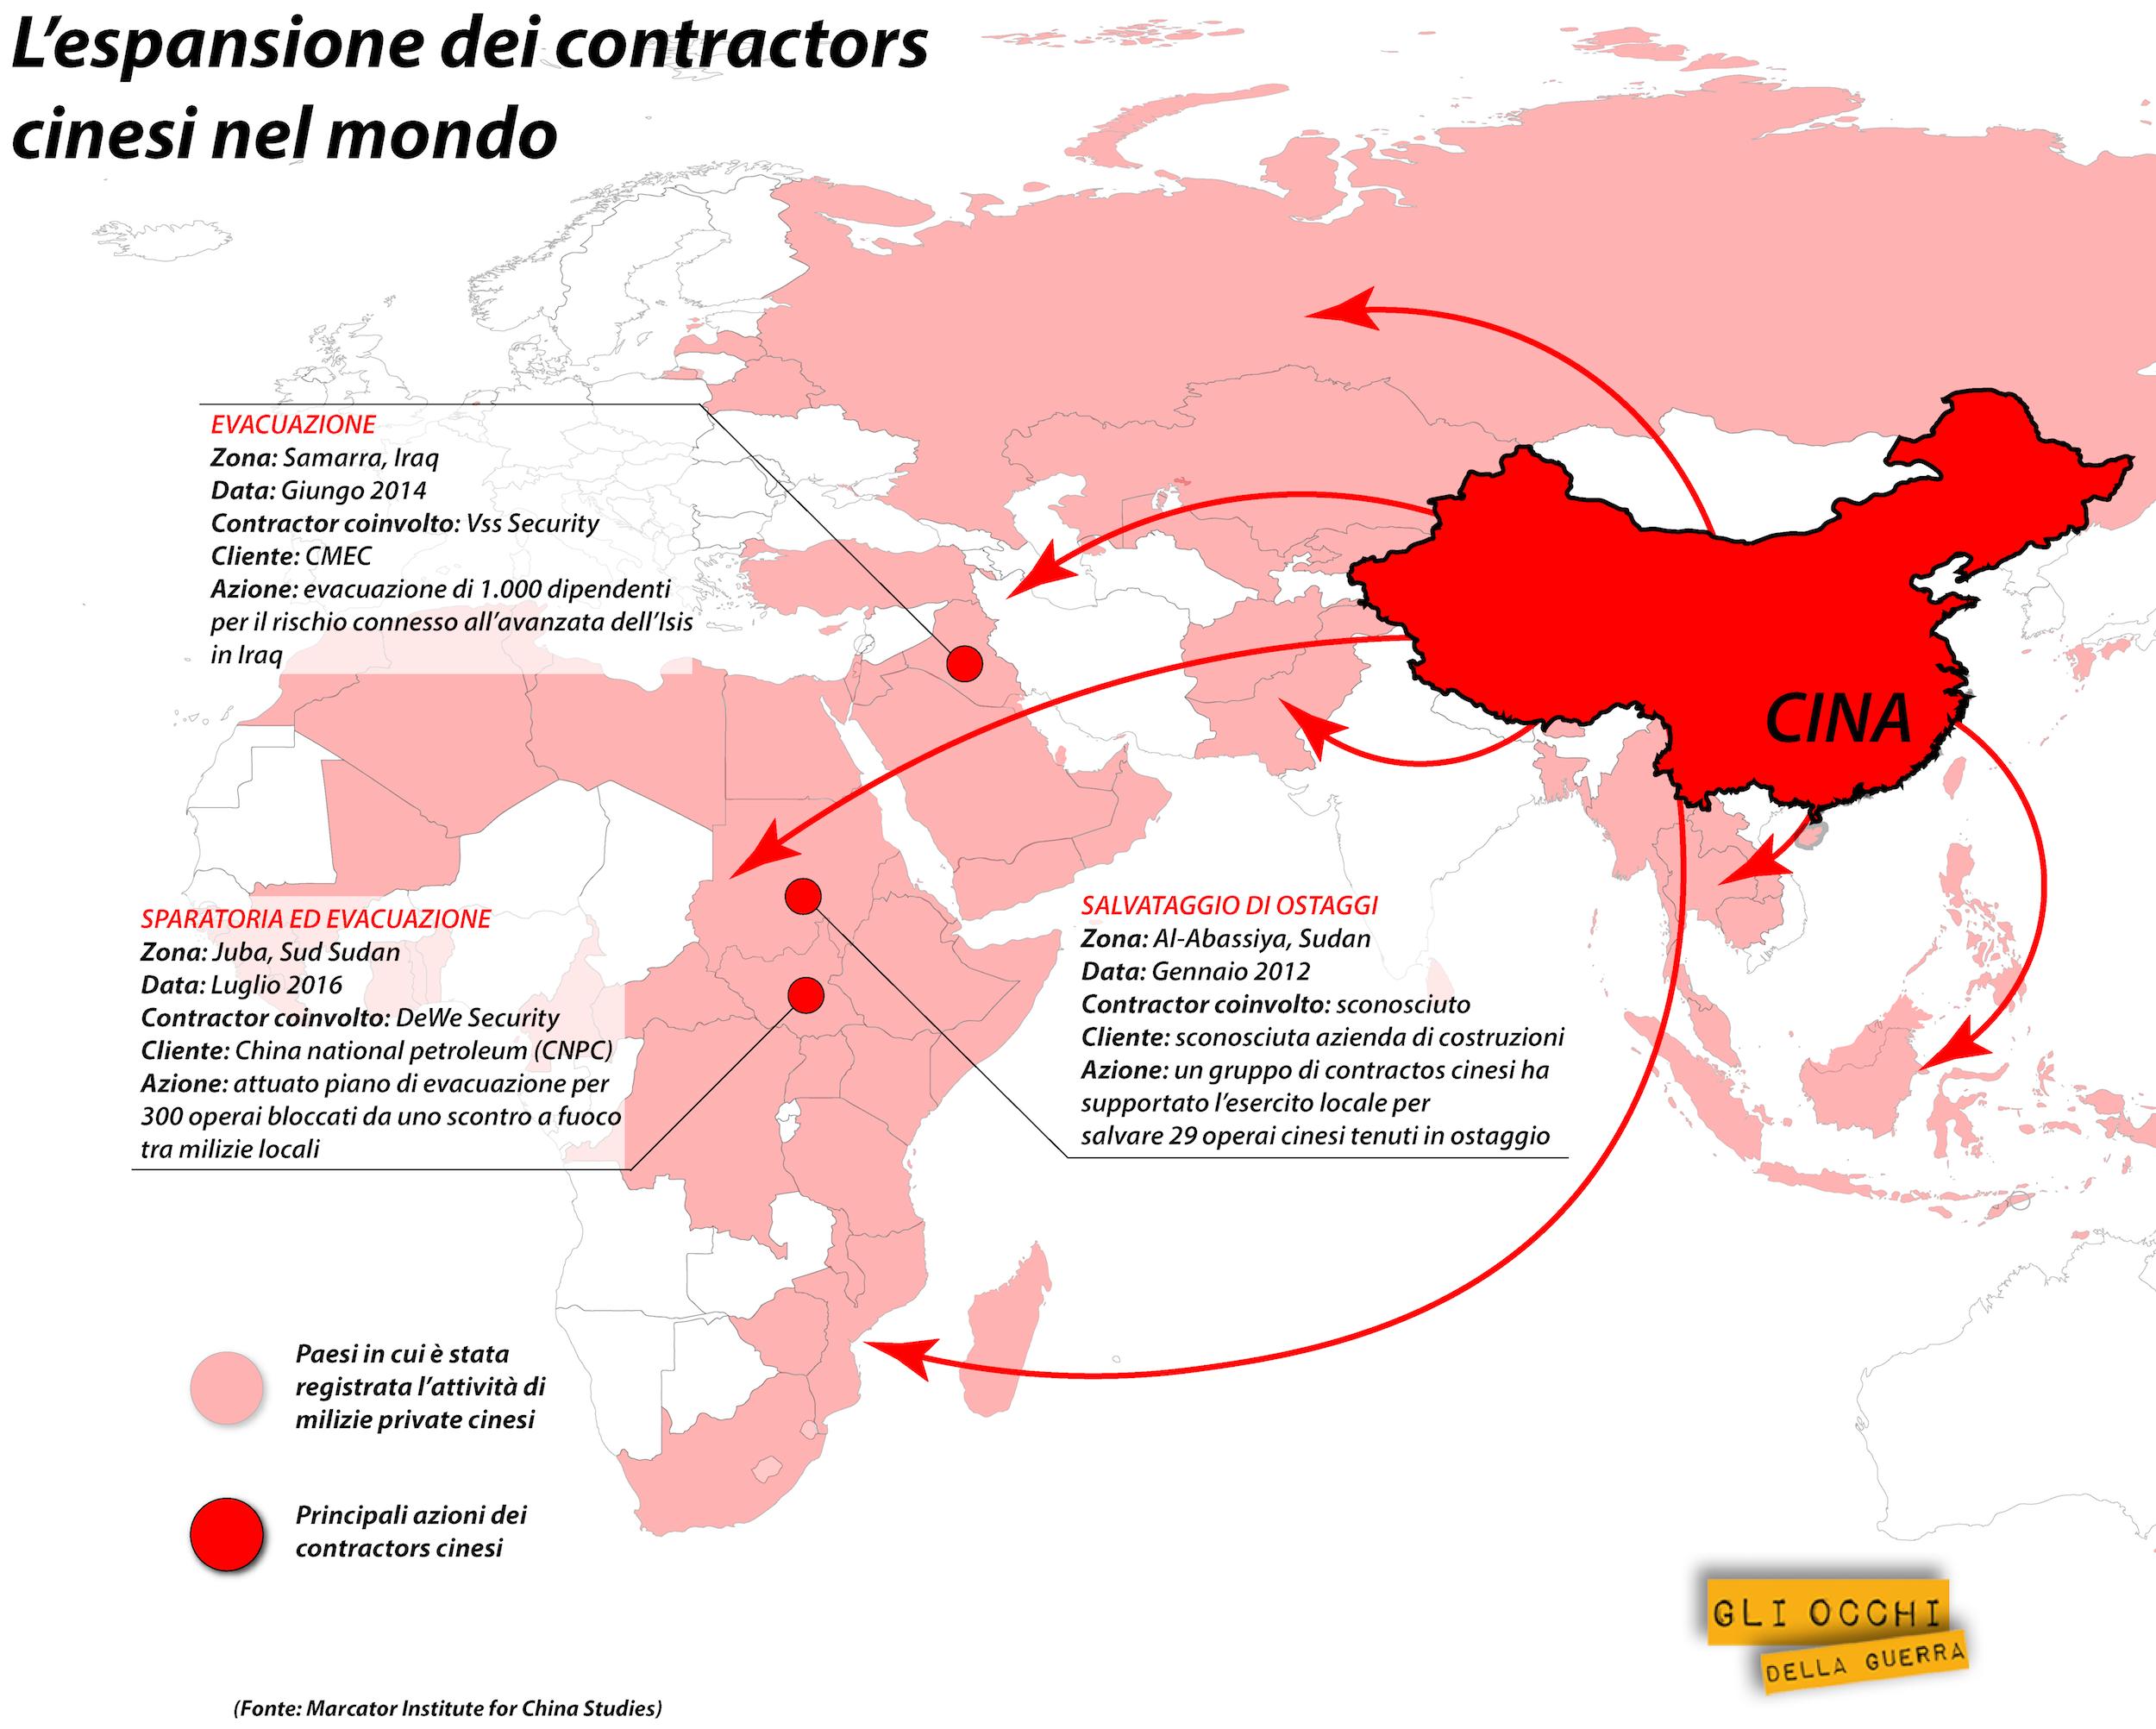 contractors della cina nel mondo